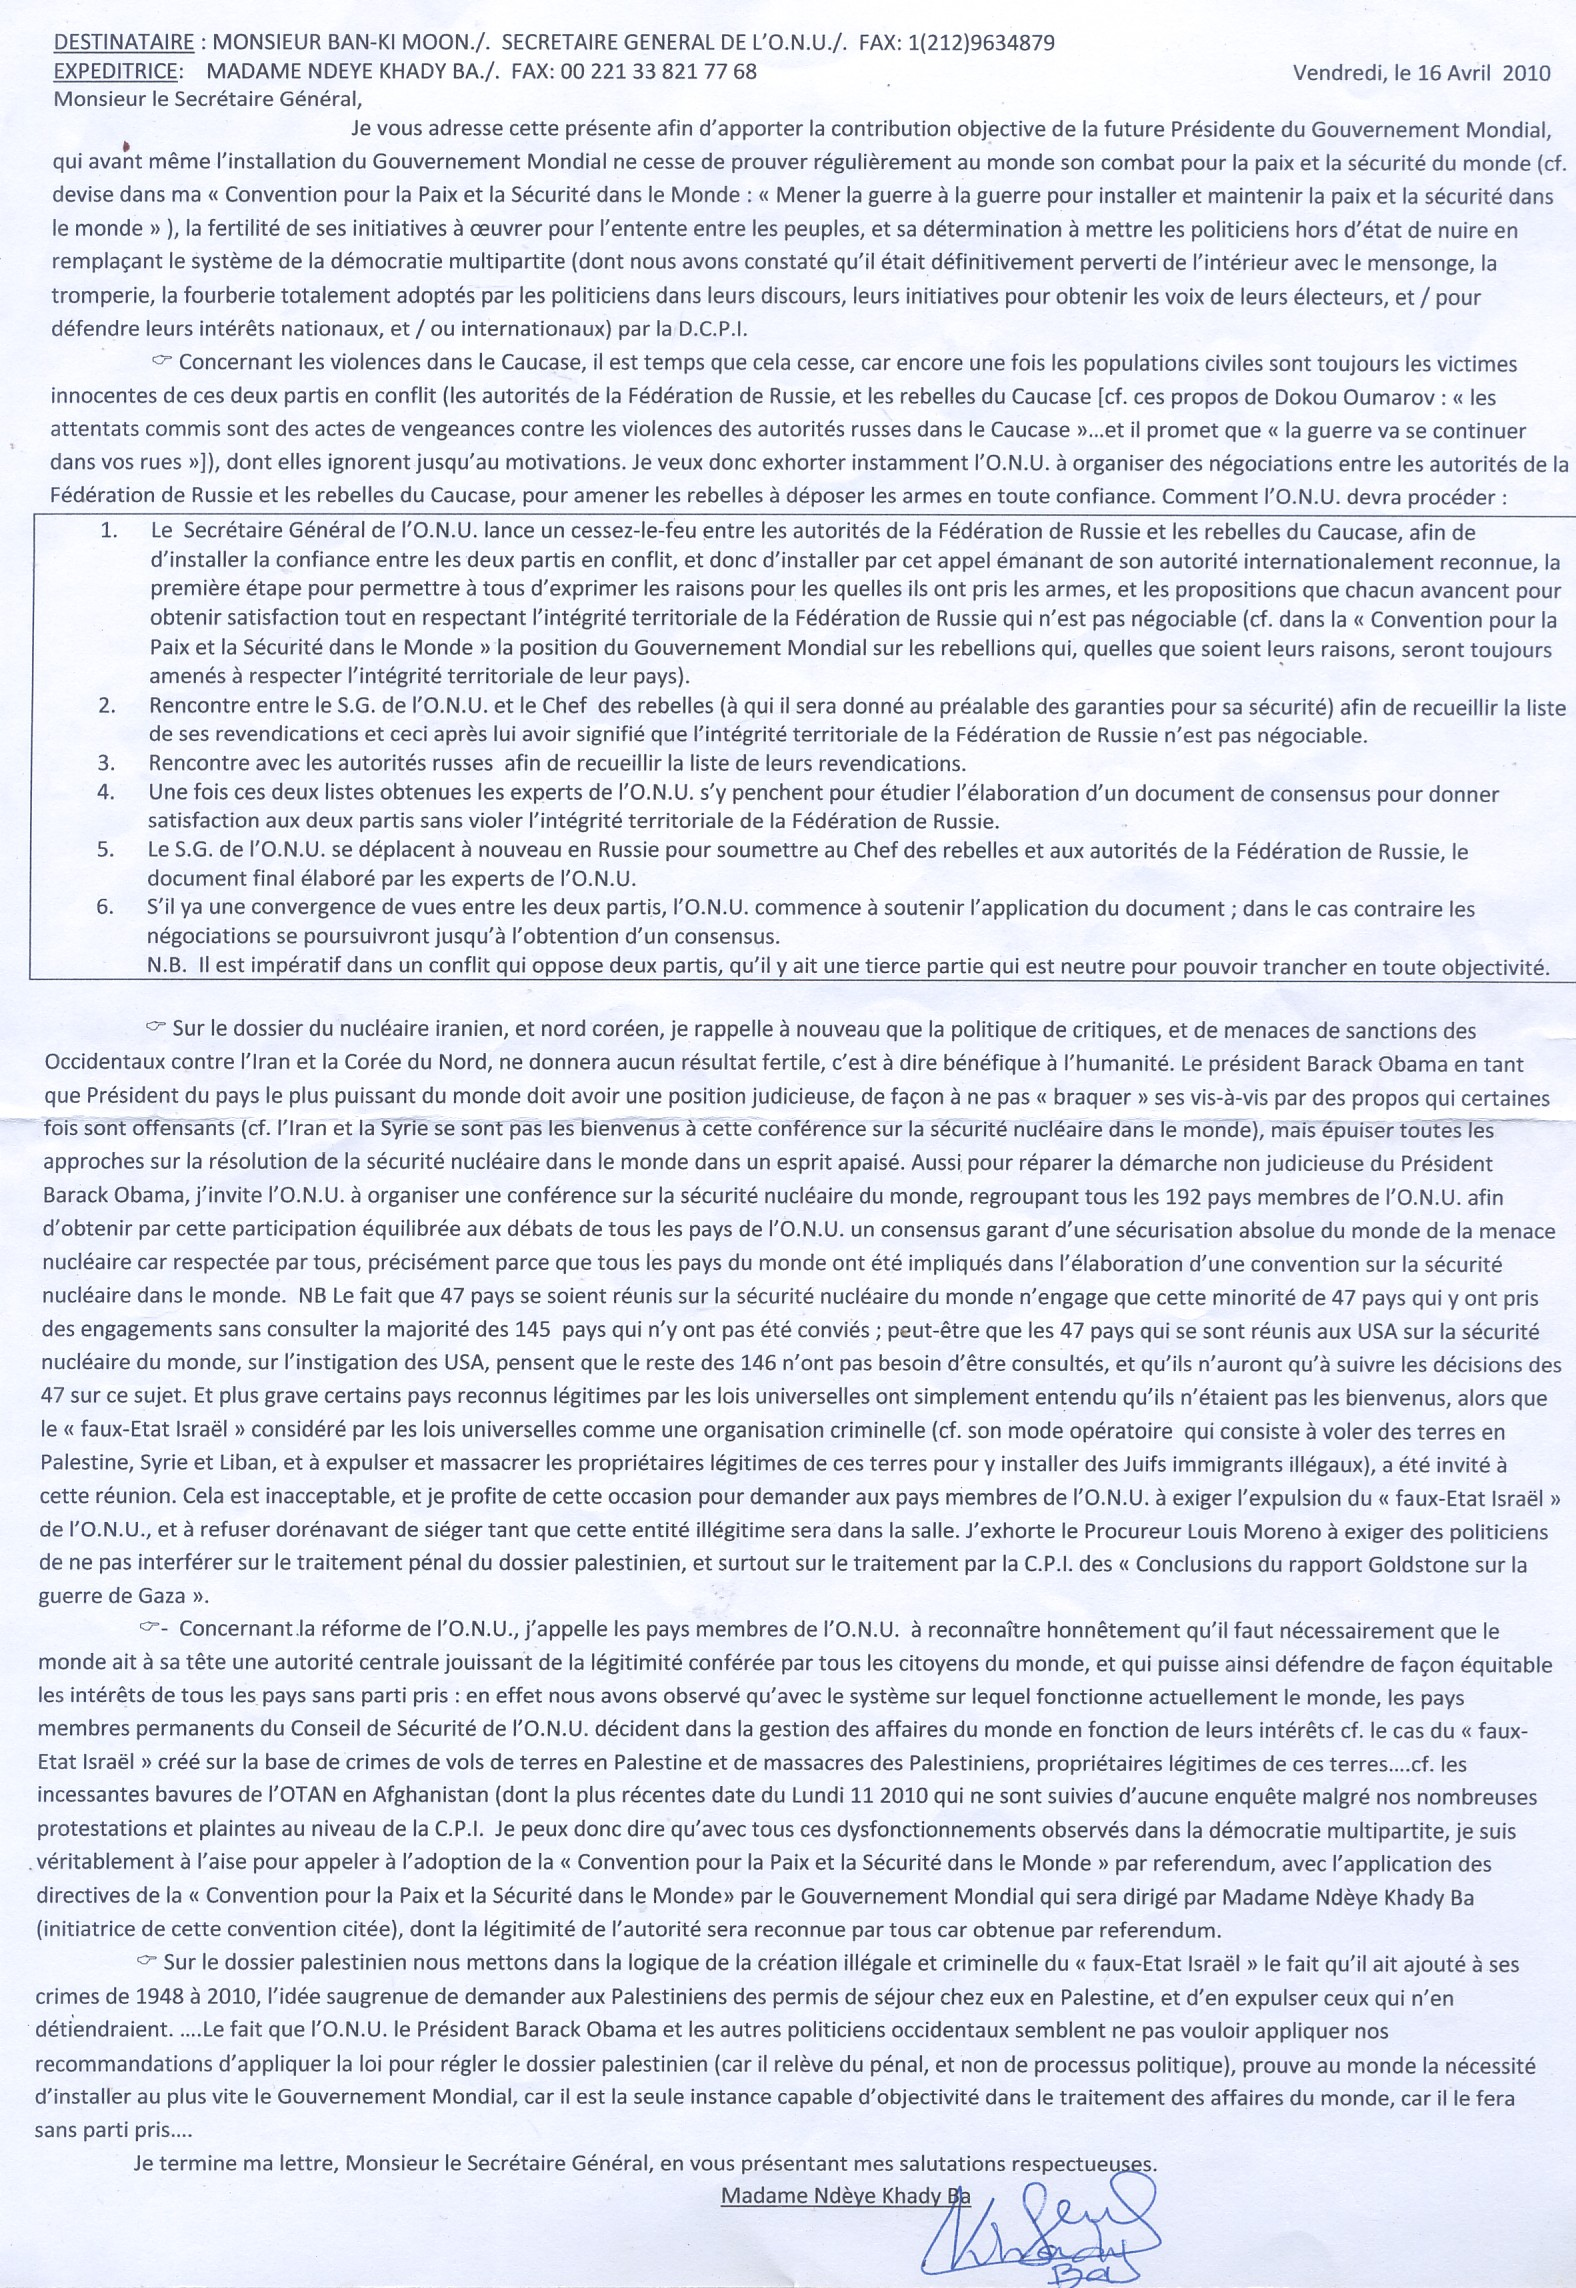 sanstitrenumrisation02.jpg